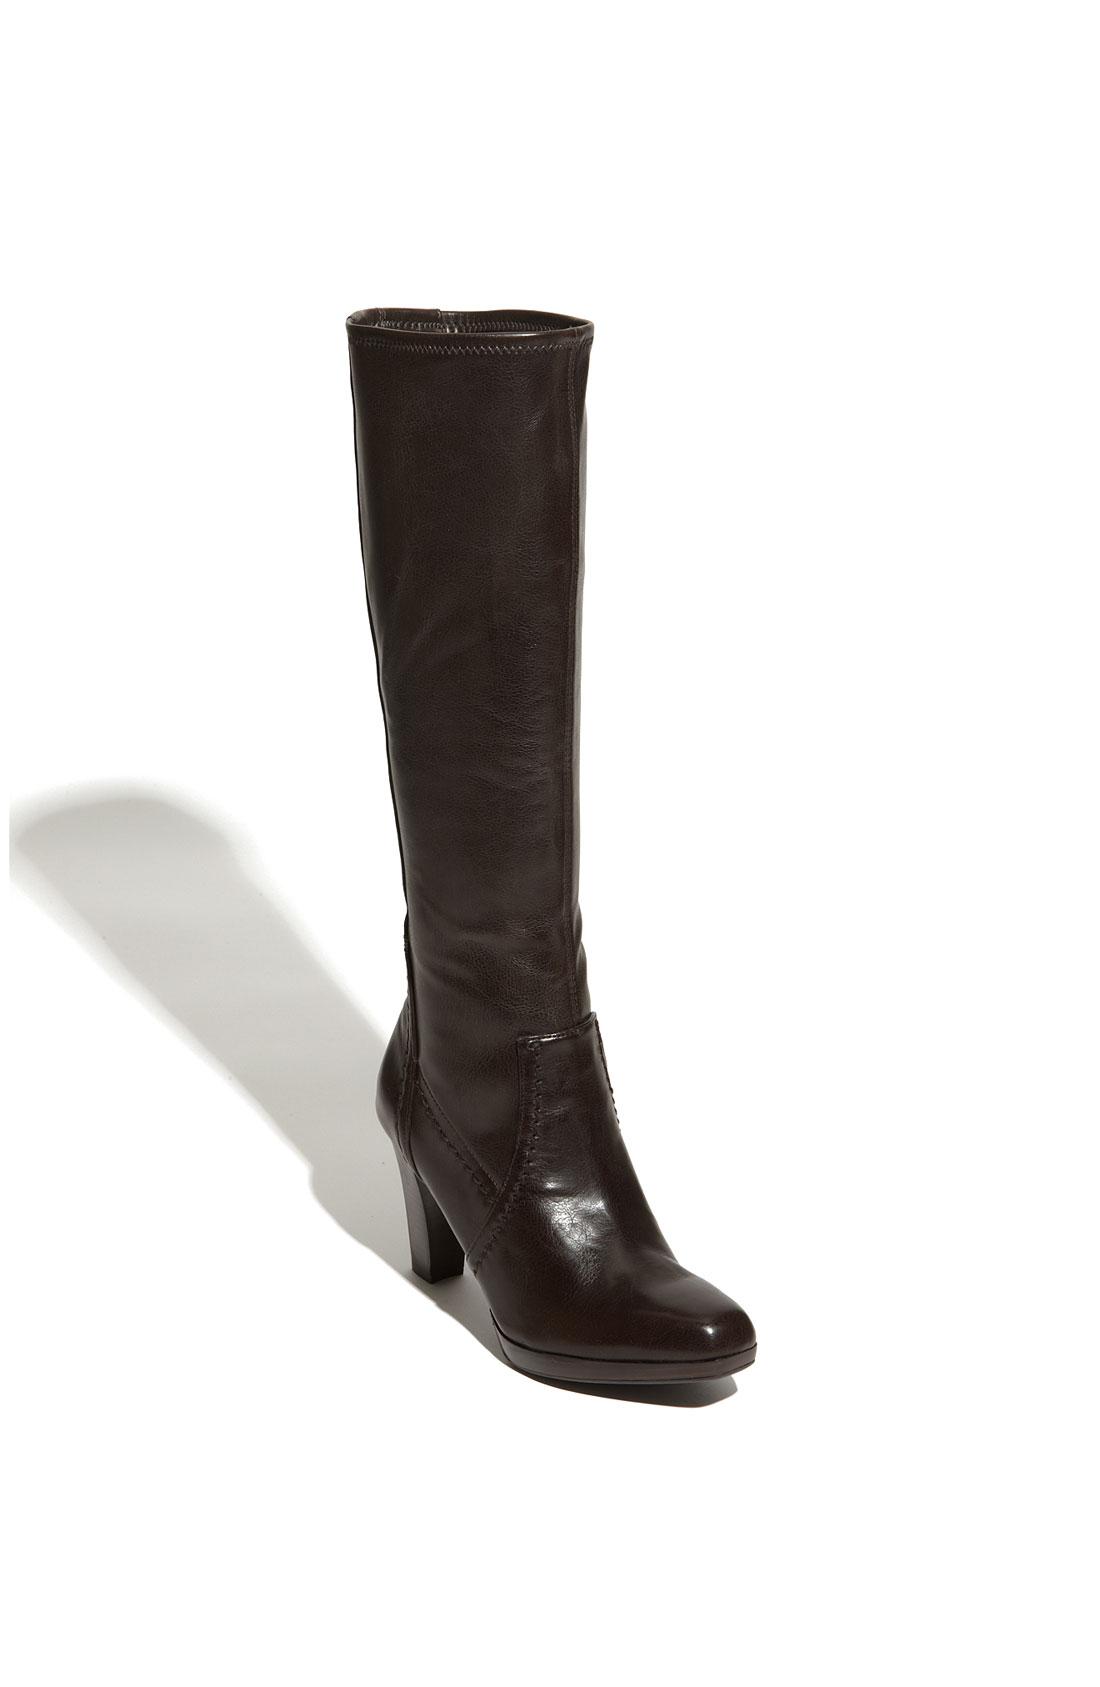 franco sarto yonkers stretch boot in black tmoro lyst